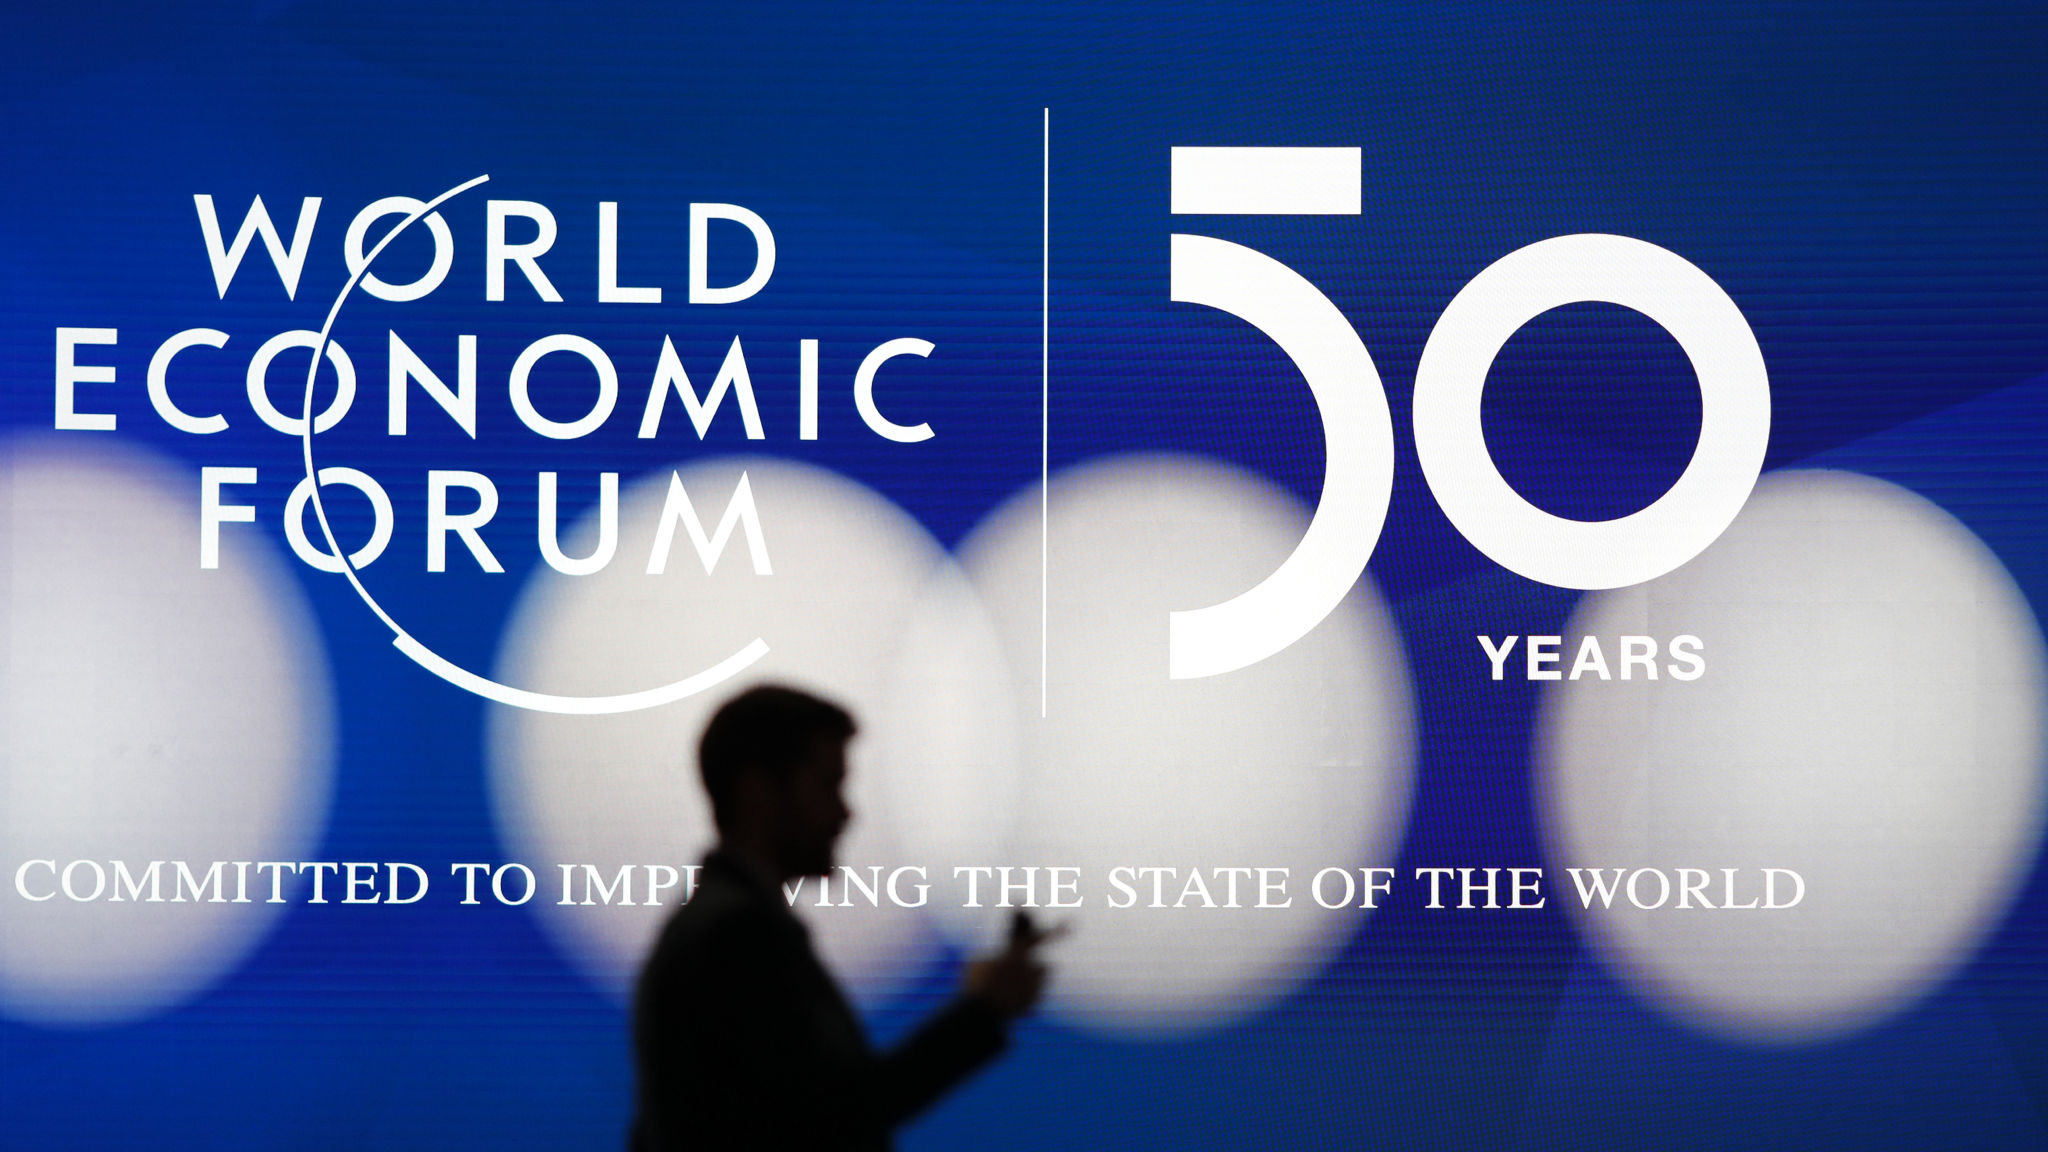 The World Economic Forum (WEF) marks its 50th anniversary